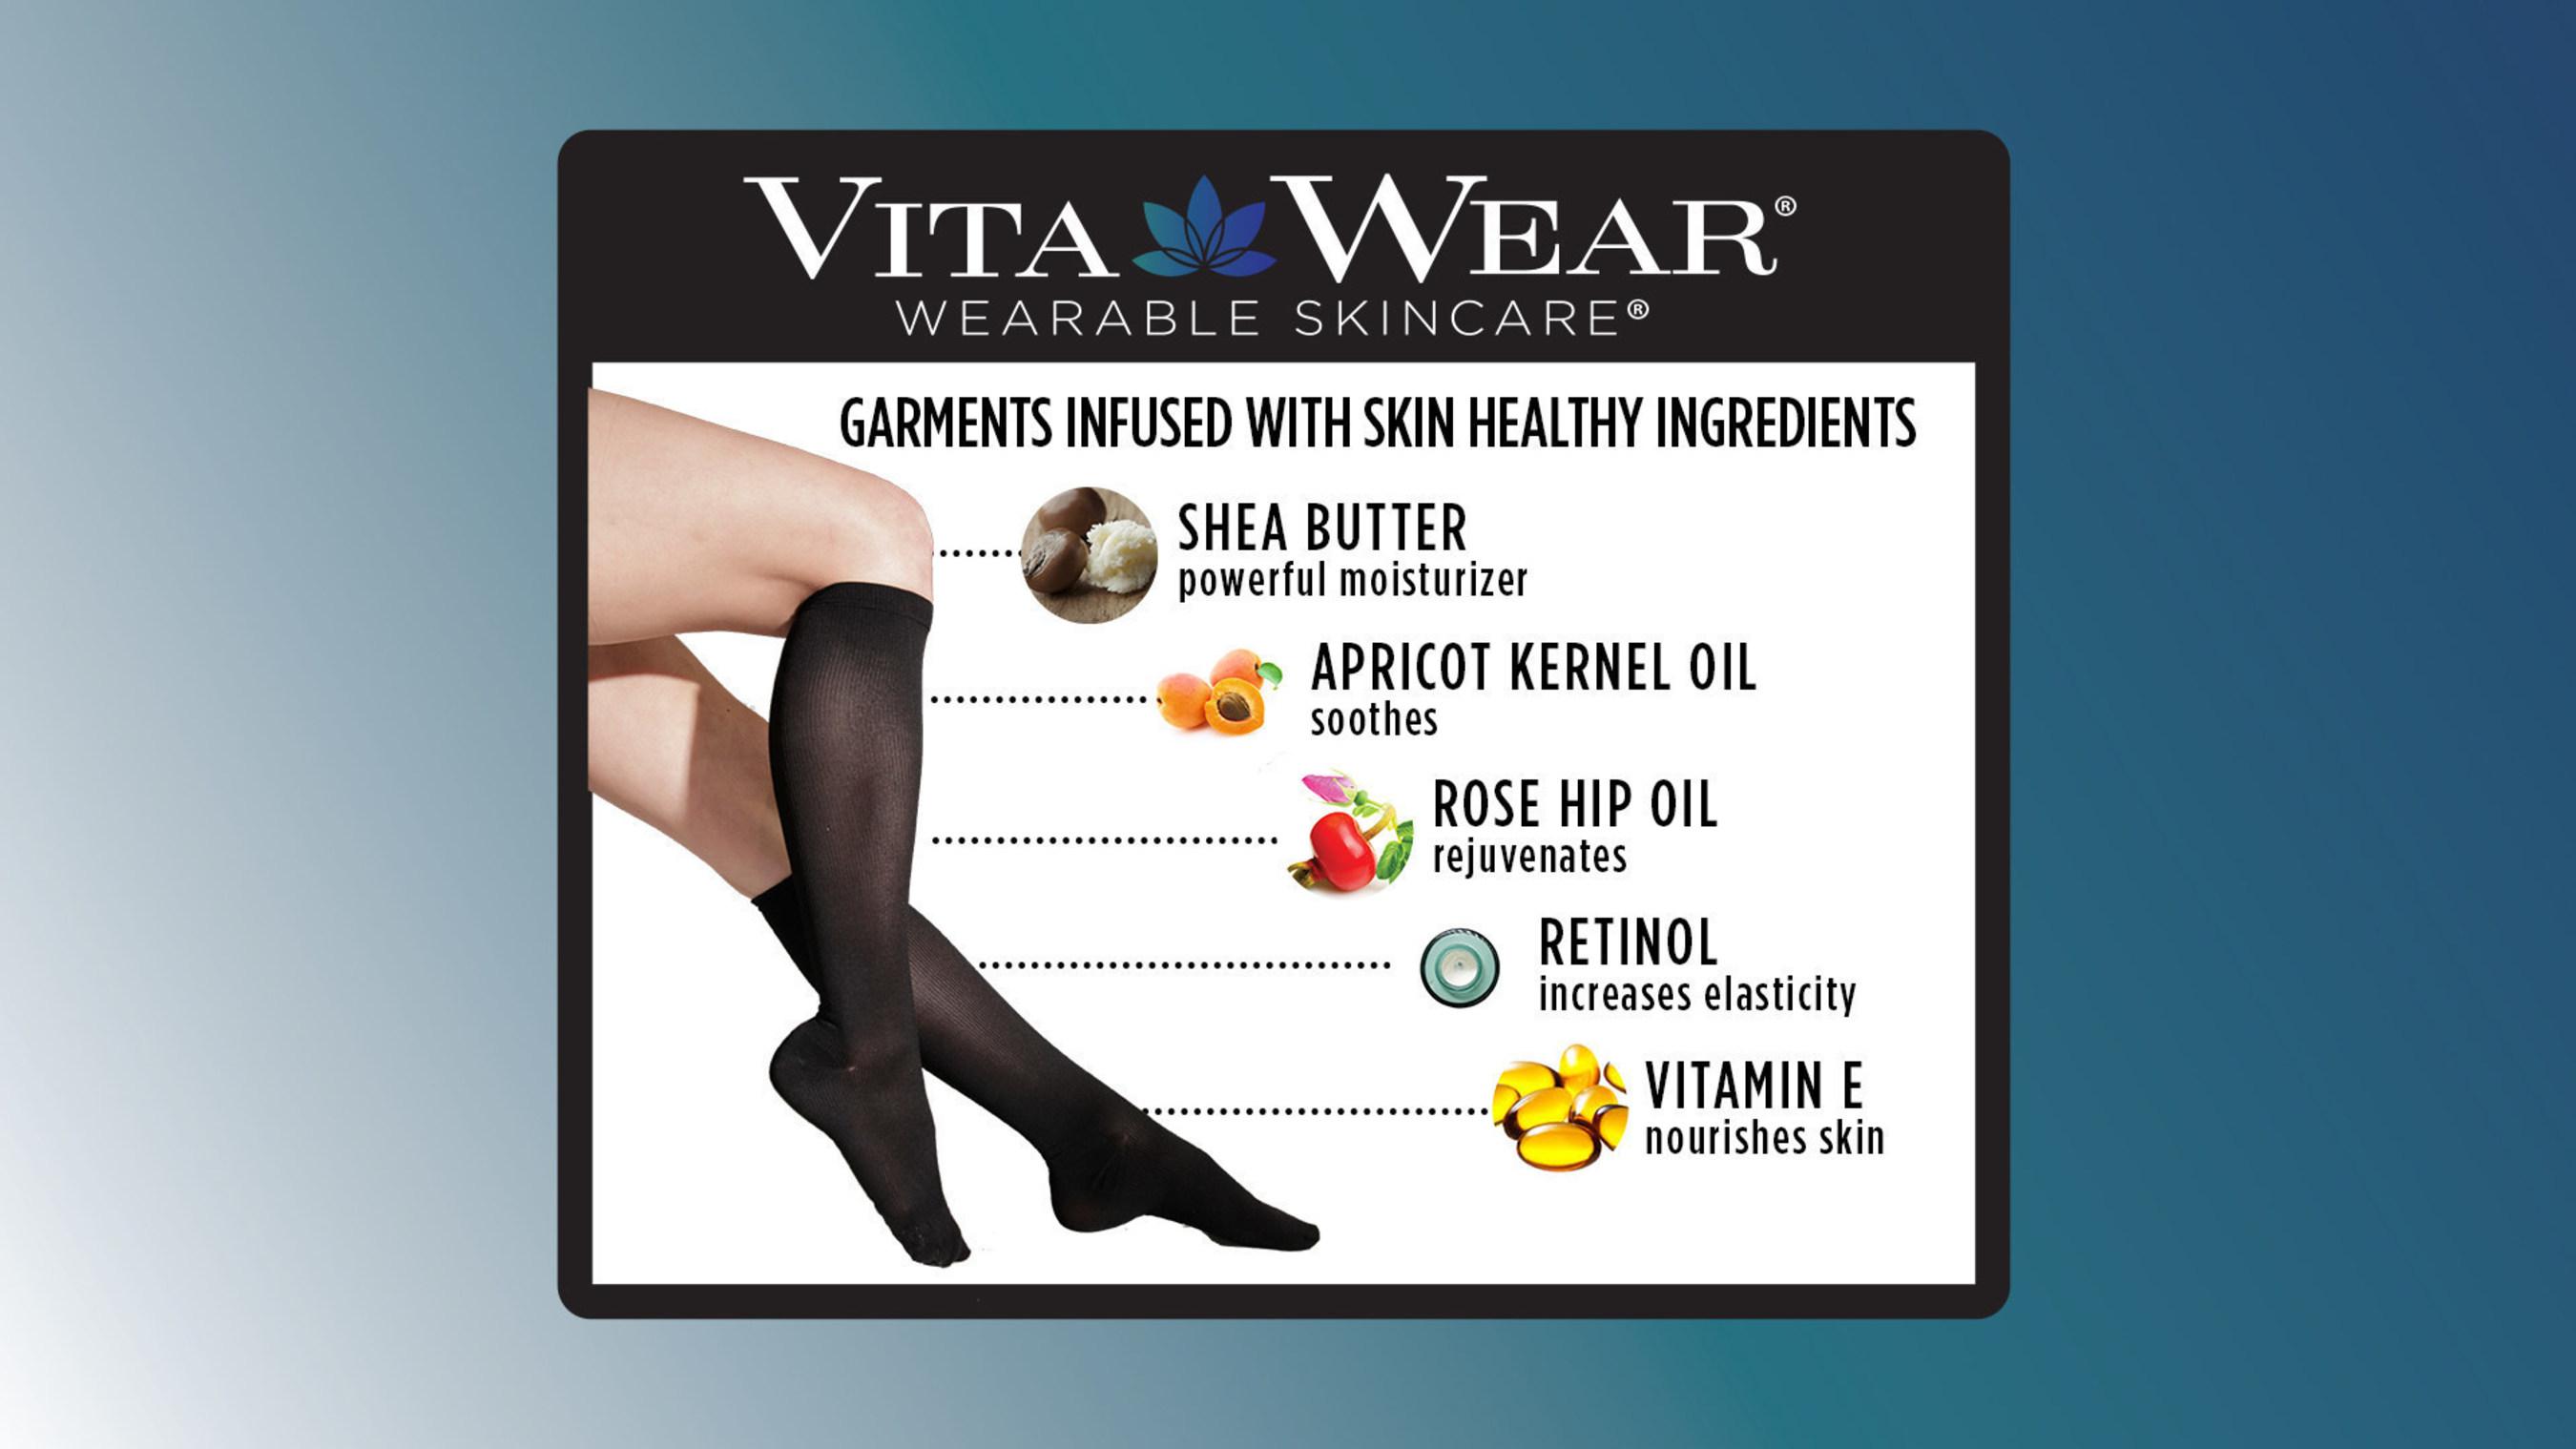 Vitawear medical grade patented wearable skin care